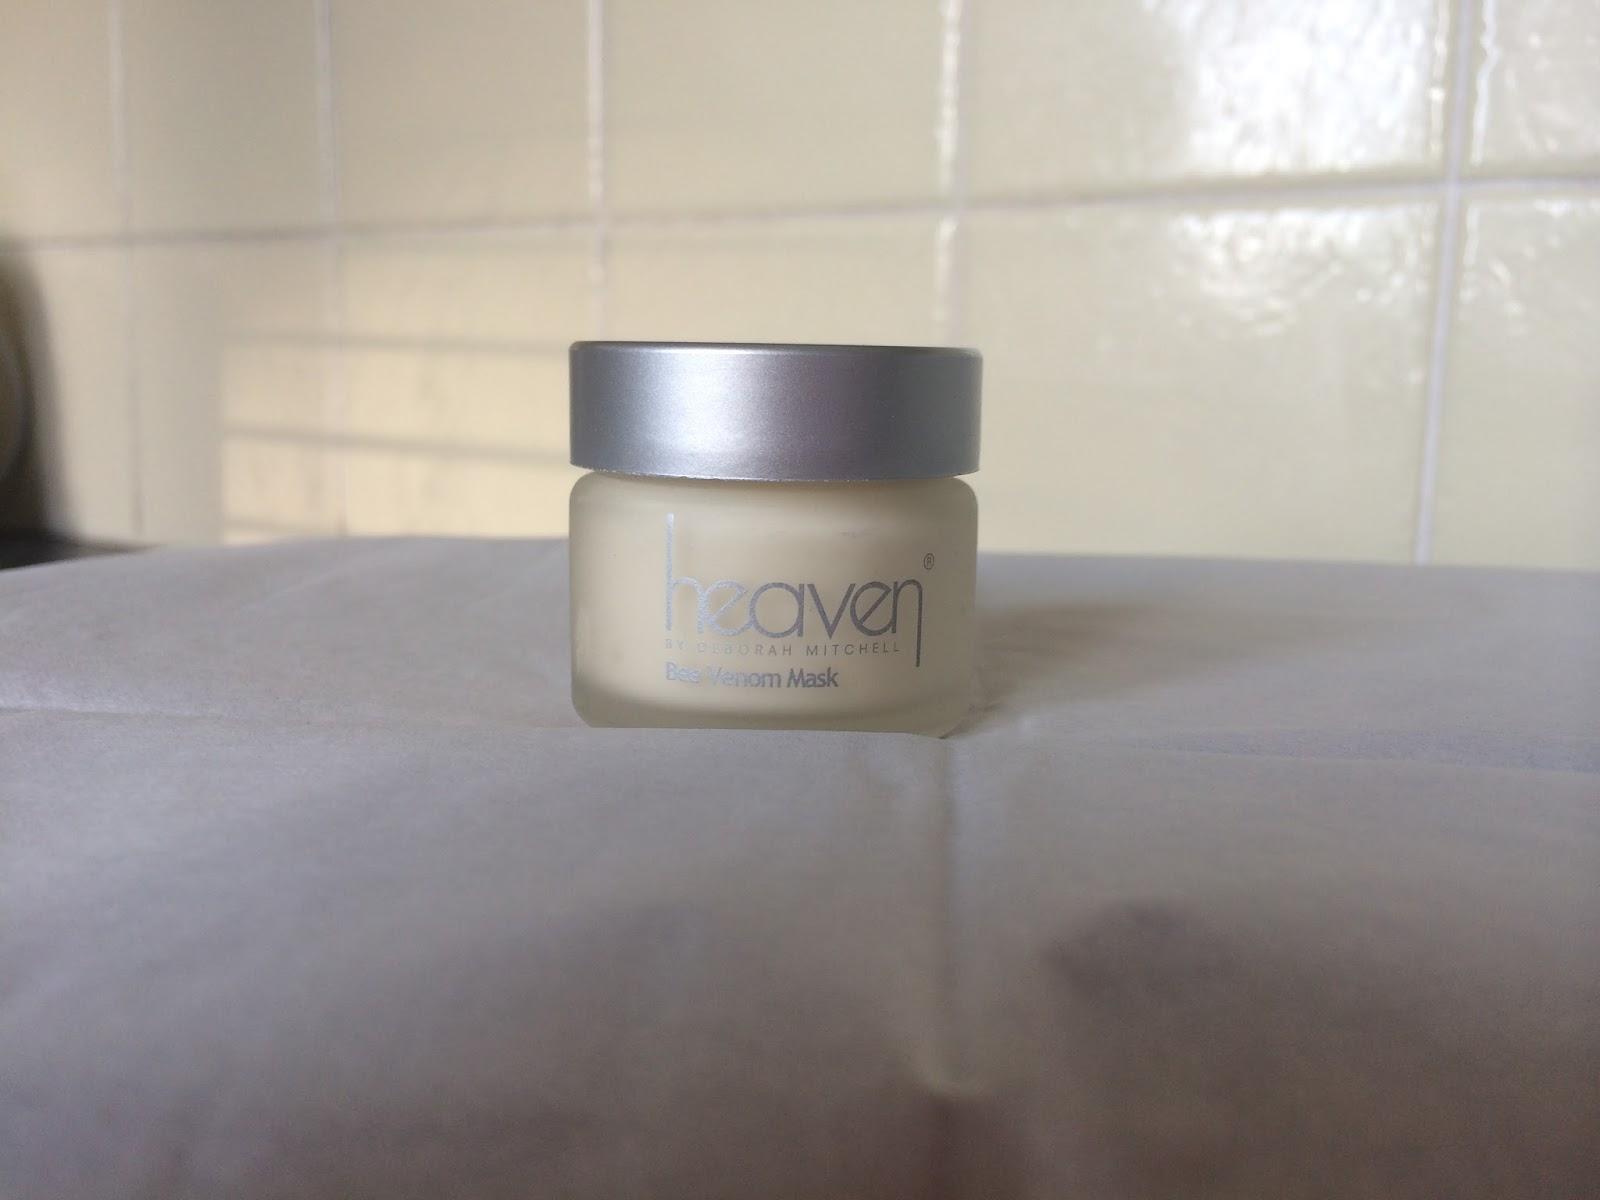 Heaven Skincare Bee Venom Face Mask